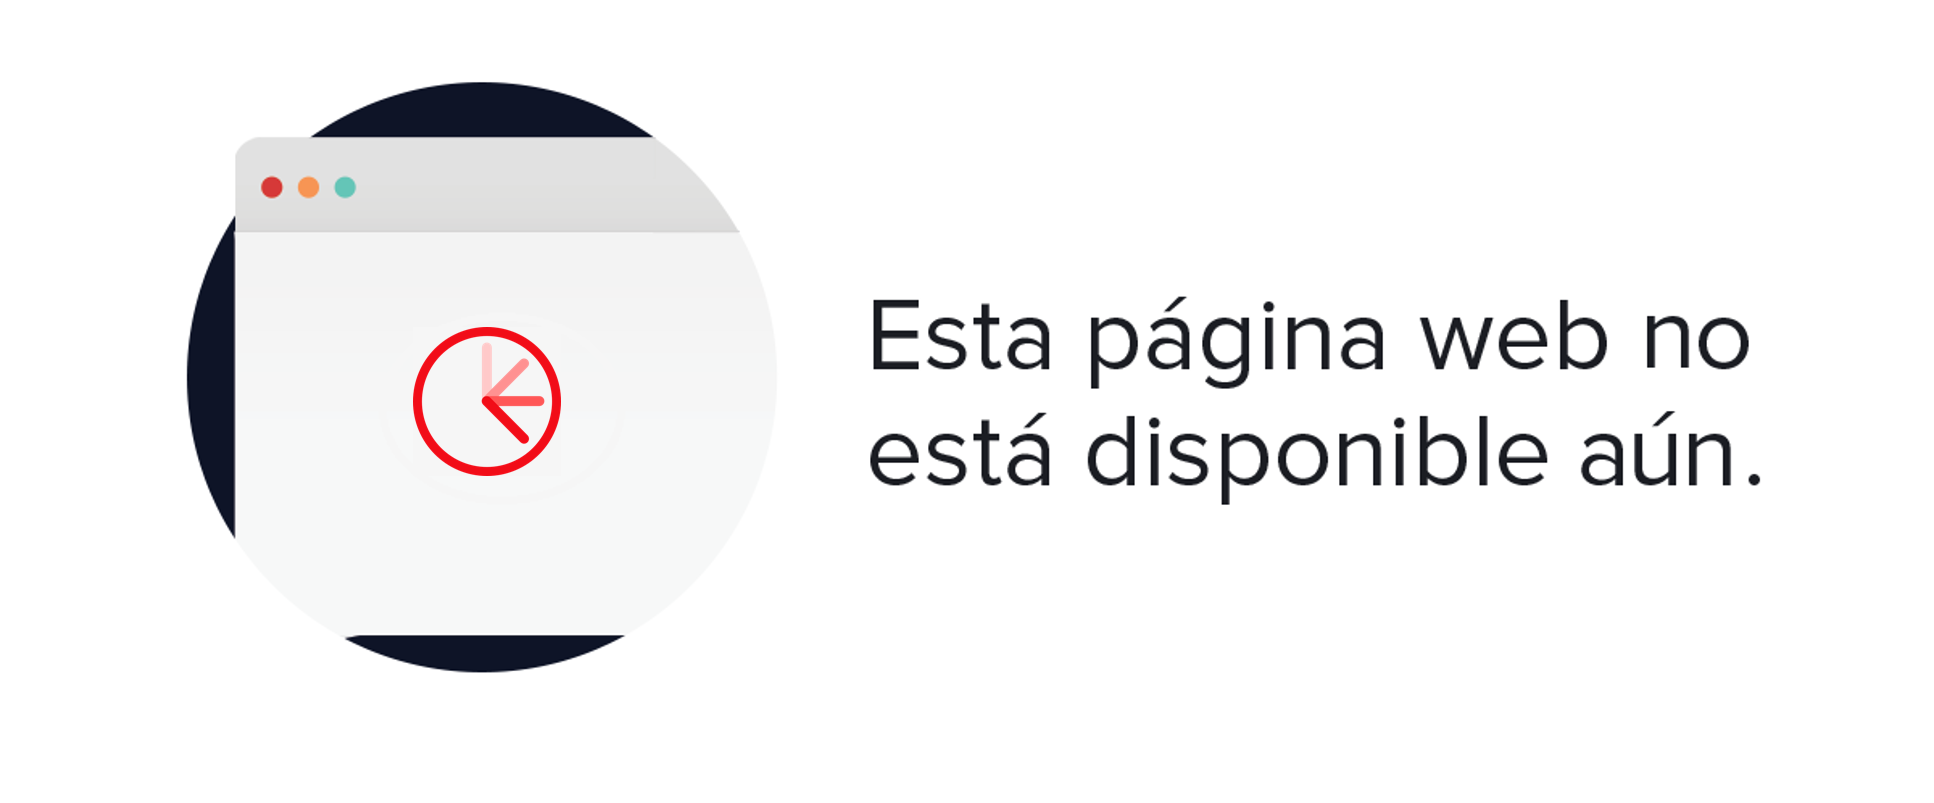 Easy Wear - Pantalón pitillo de mujer Easy Wear de punto roma Negro 001041572101727034 - JZKYSJP